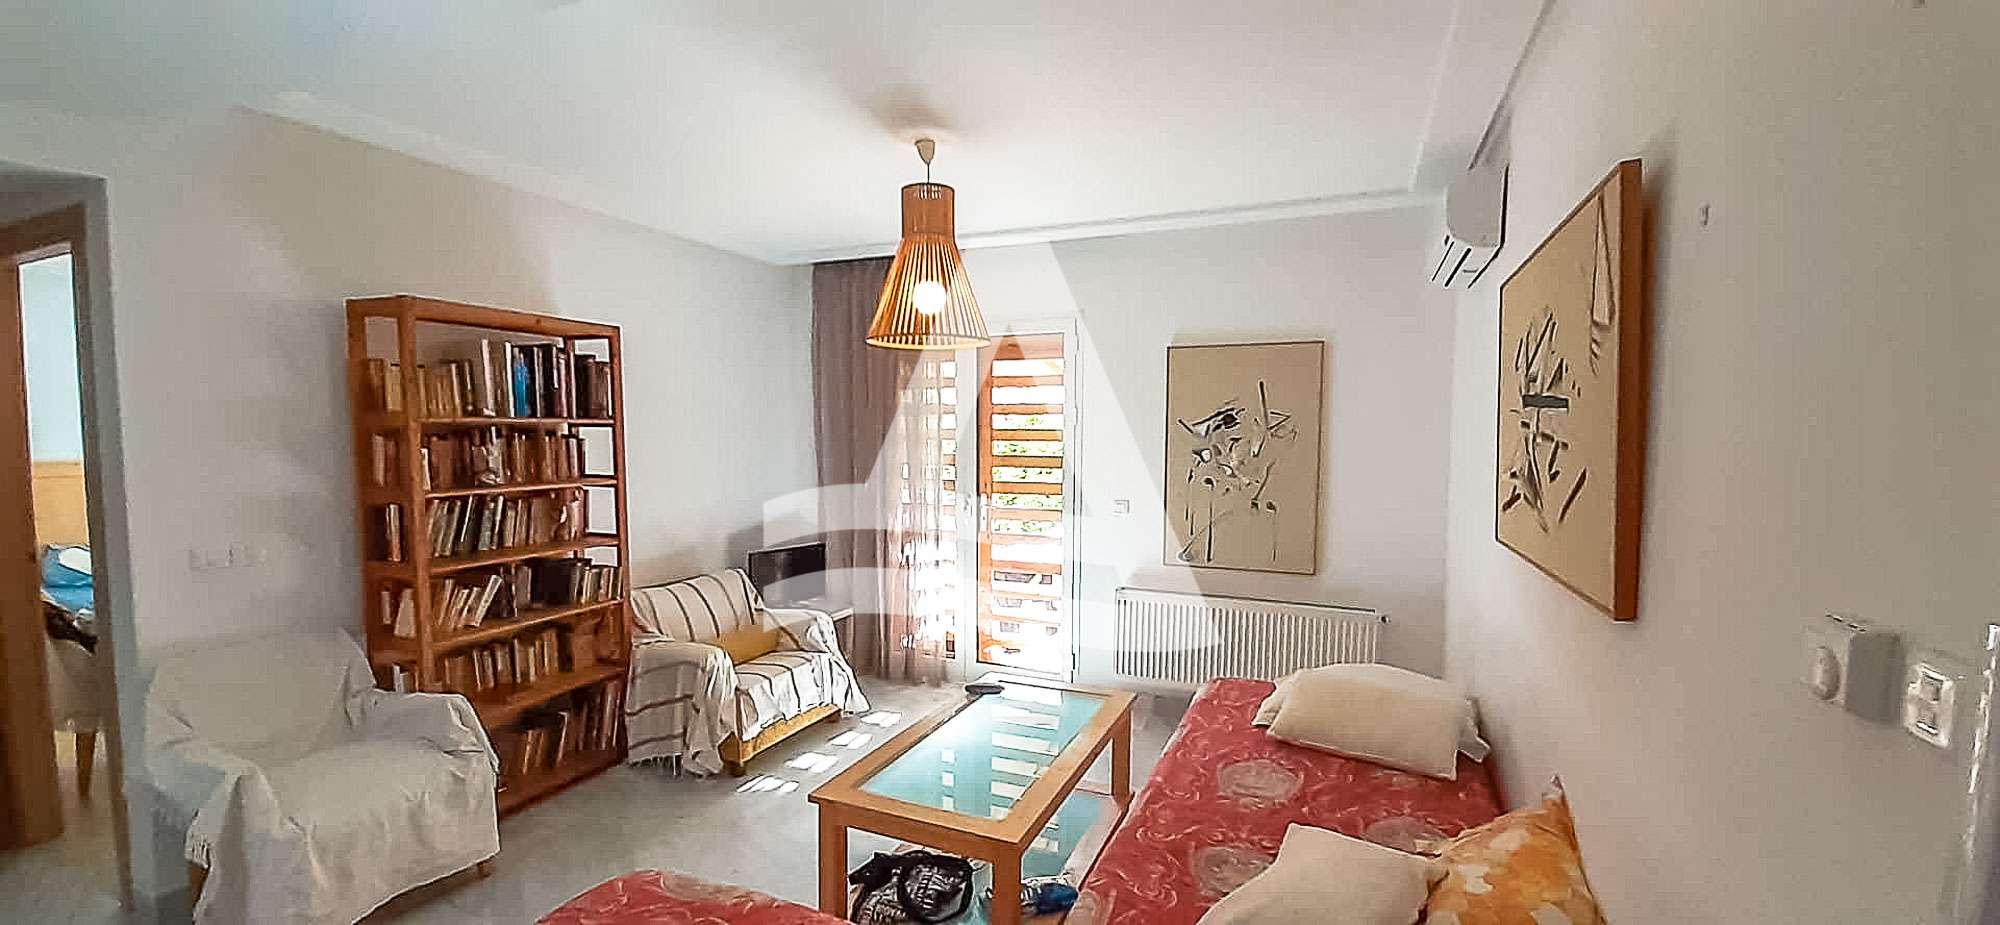 httpss3.amazonaws.comlogimoaws_Arcane_immobilière_la_Marsa-_location_-_vente_la_marsa_12_sur_12_1574441790524